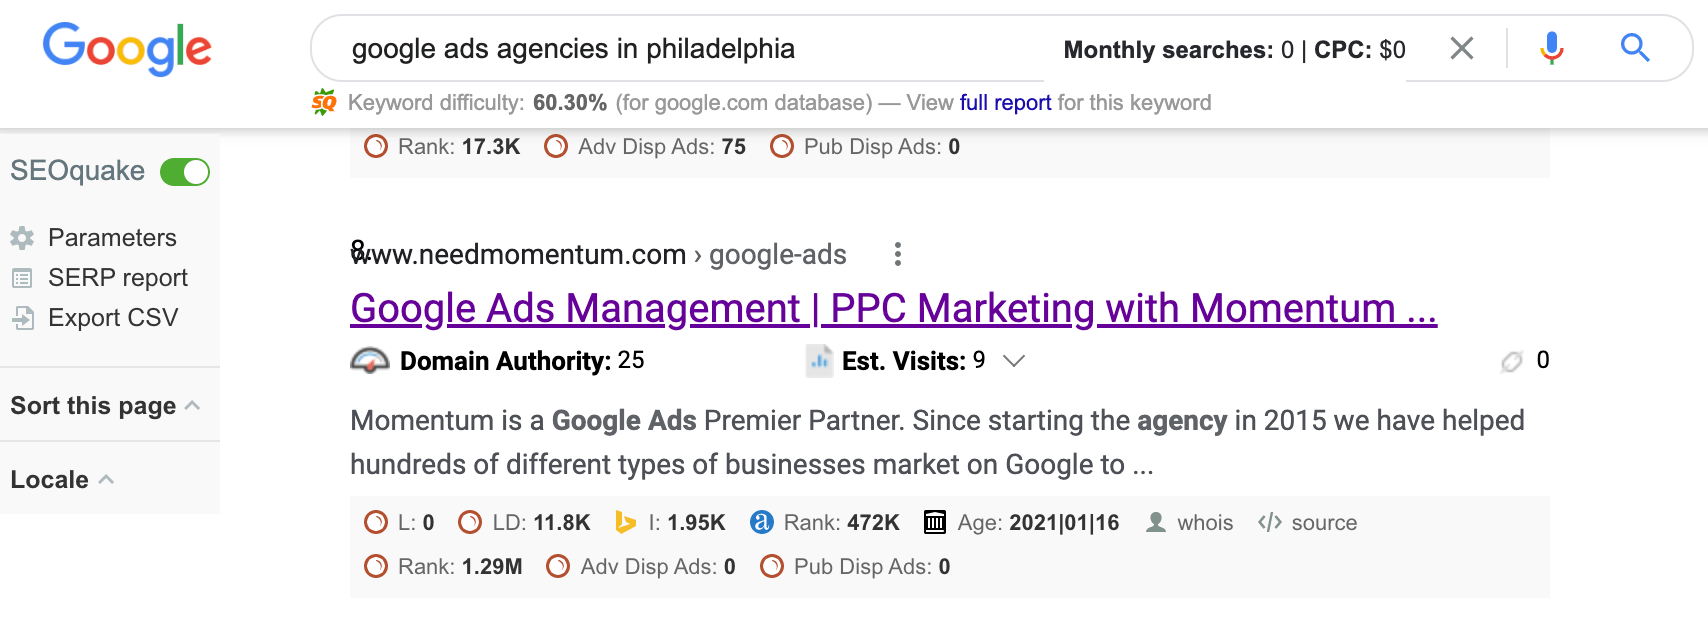 google ads agencies in philadelphia